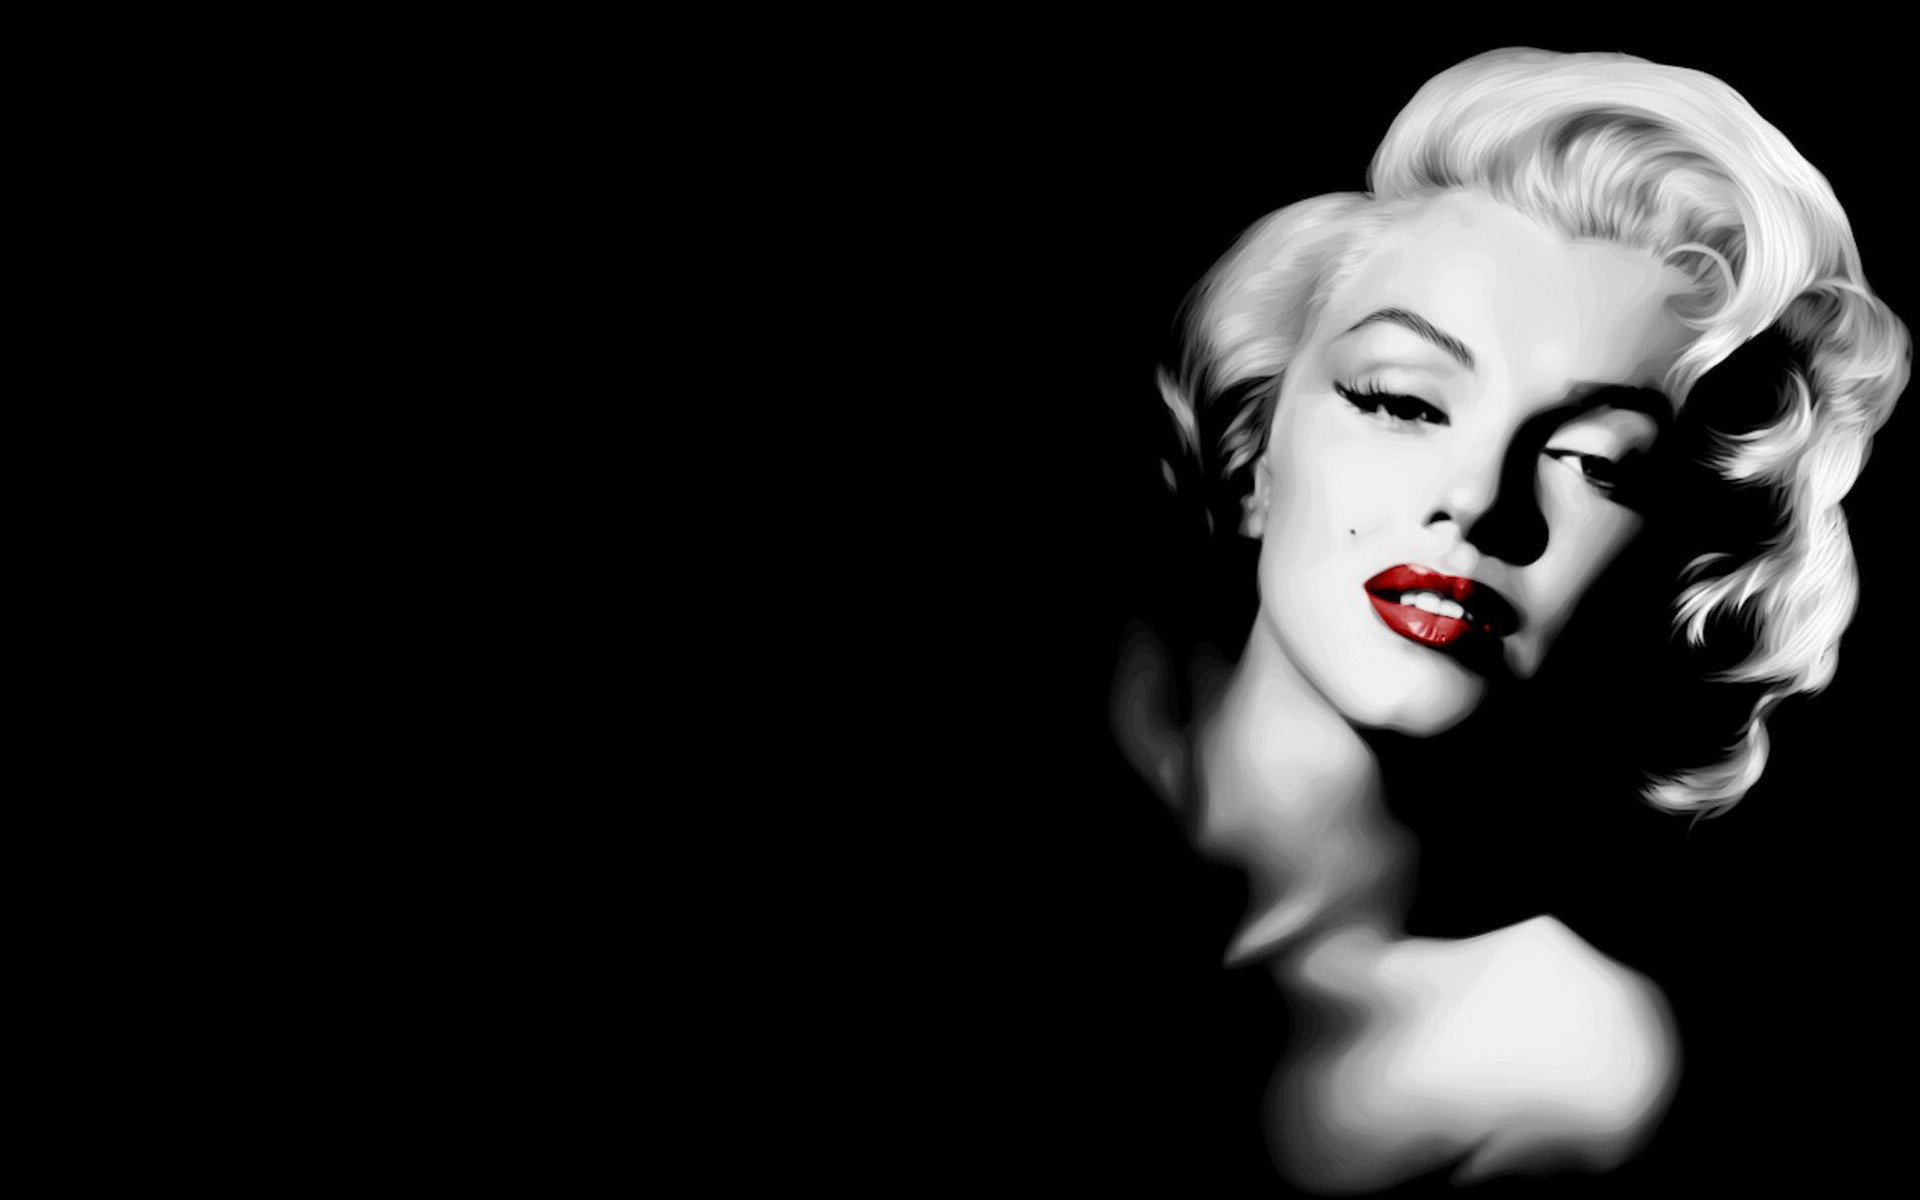 Marilyn Monroe Wallpaper 63 Images